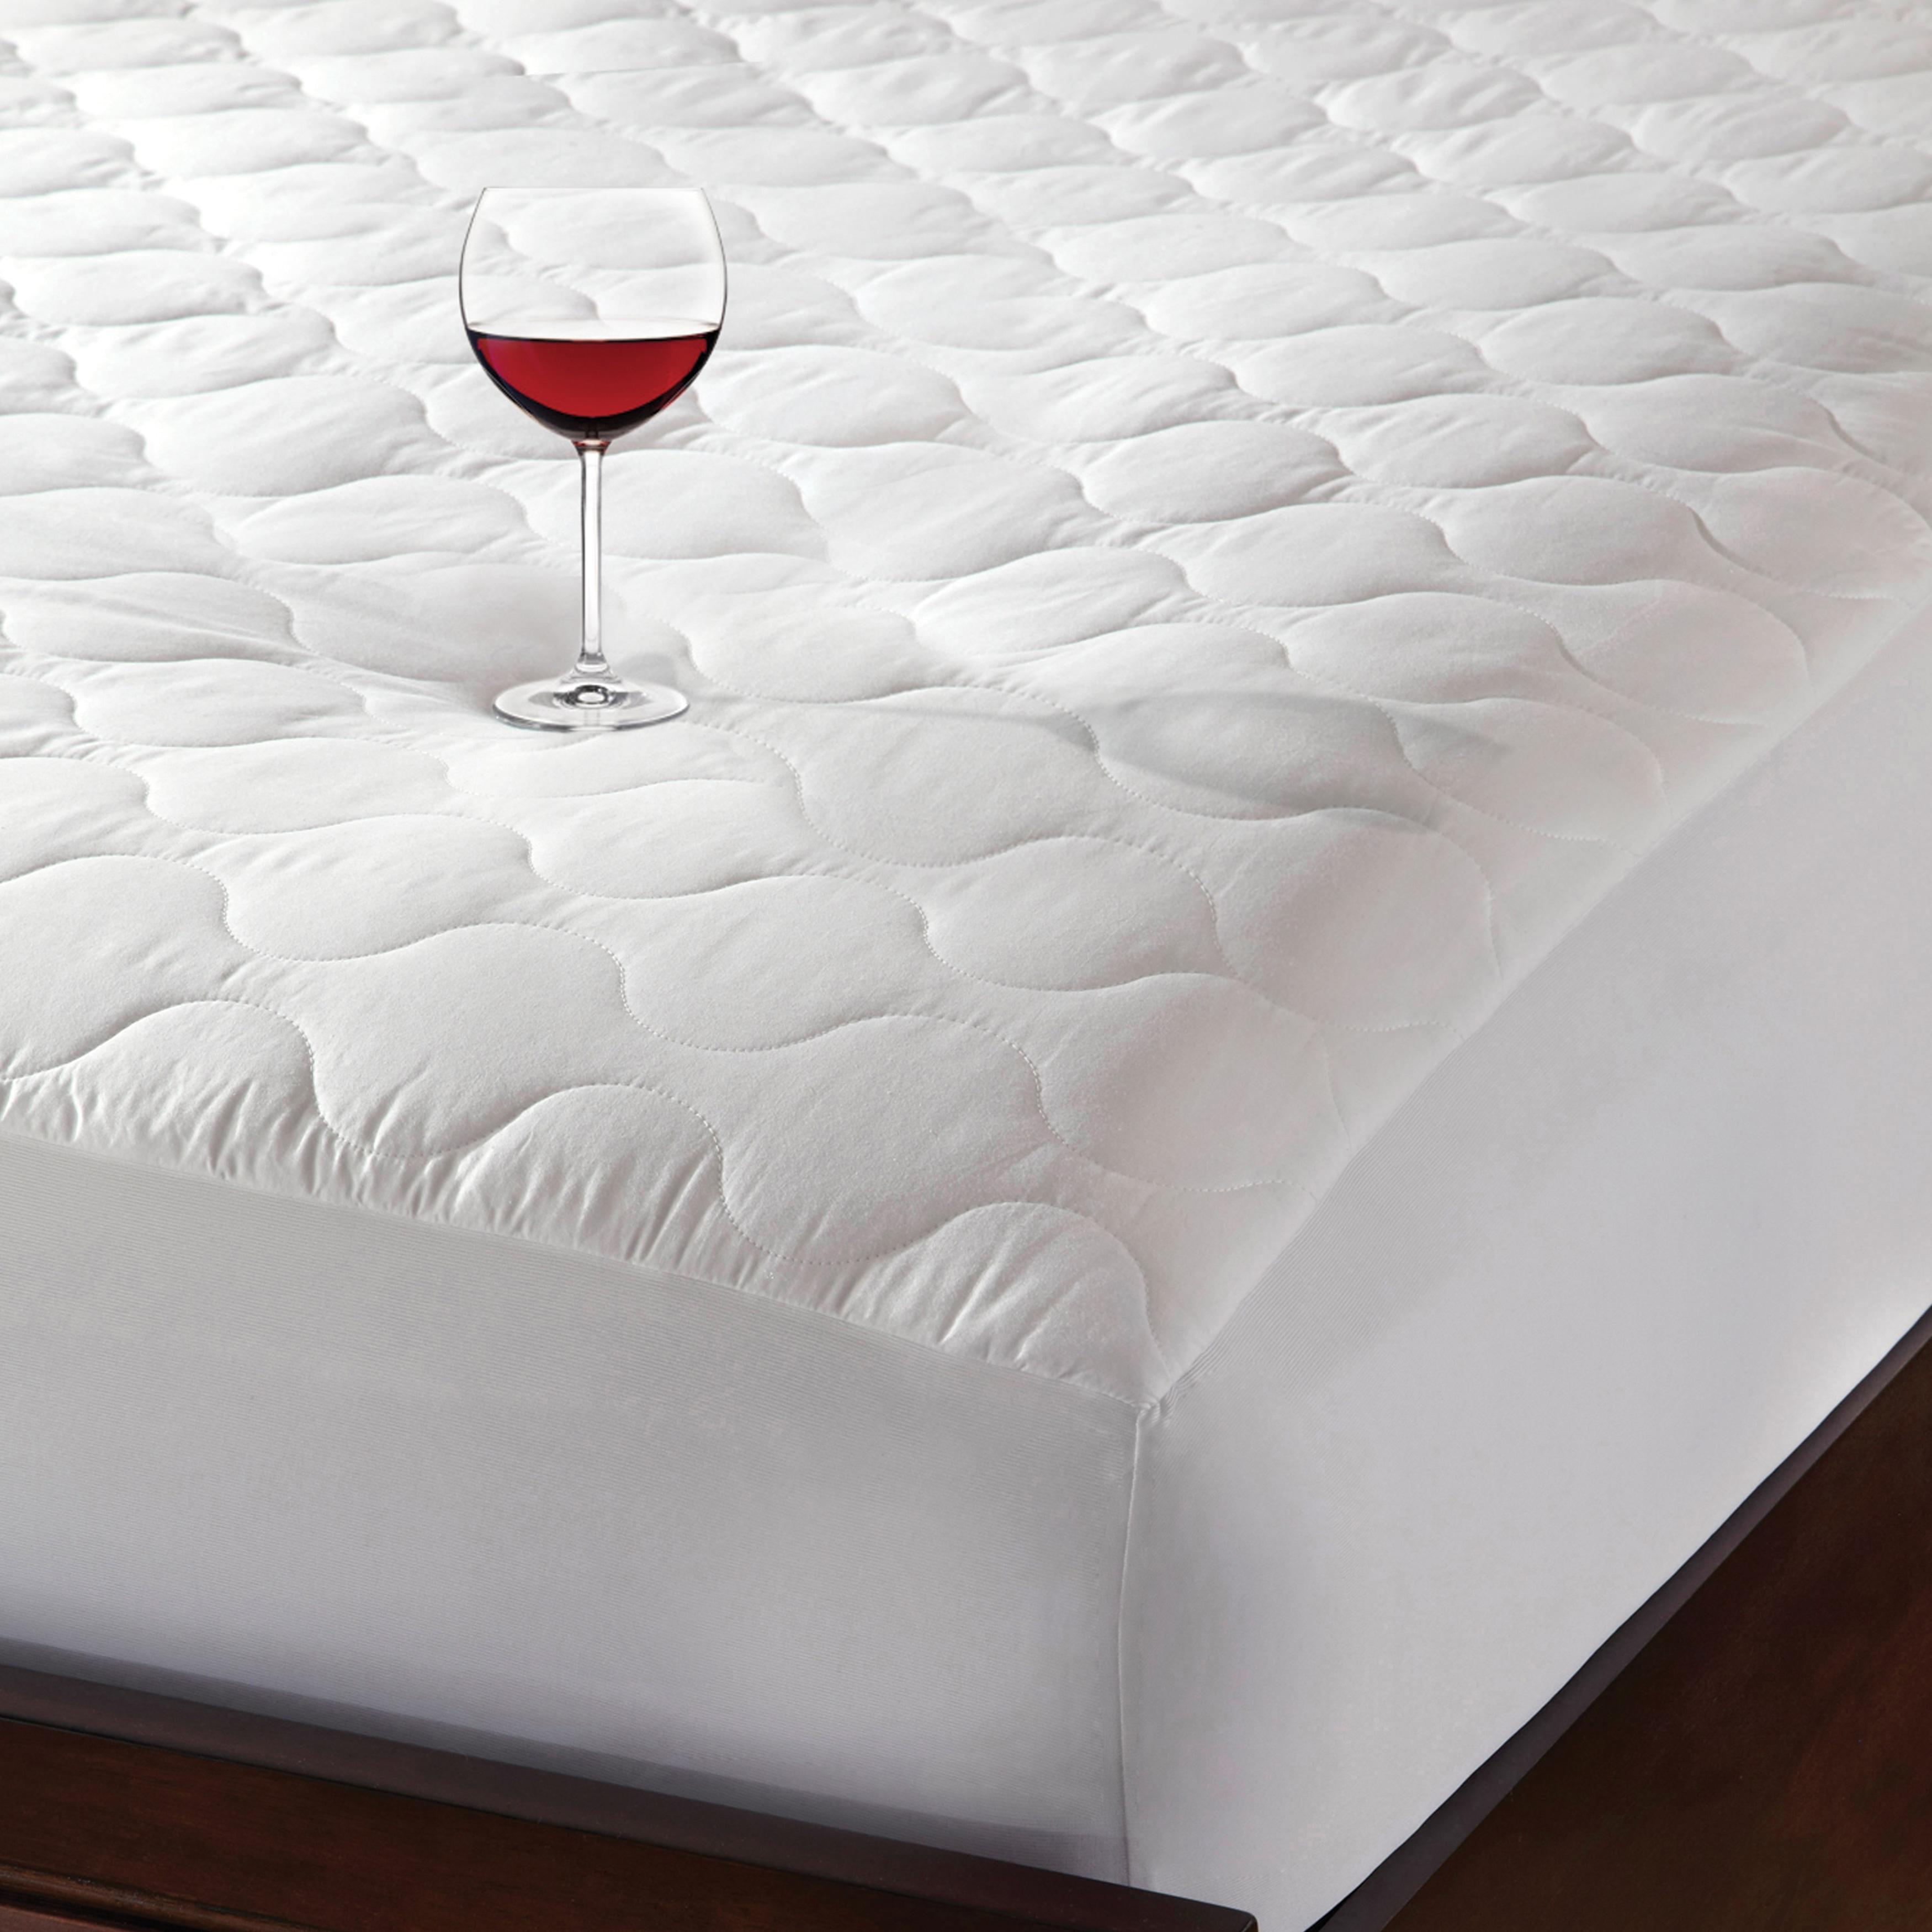 ip protector waterproof com mainstays zippered vinyl mattress cover walmart